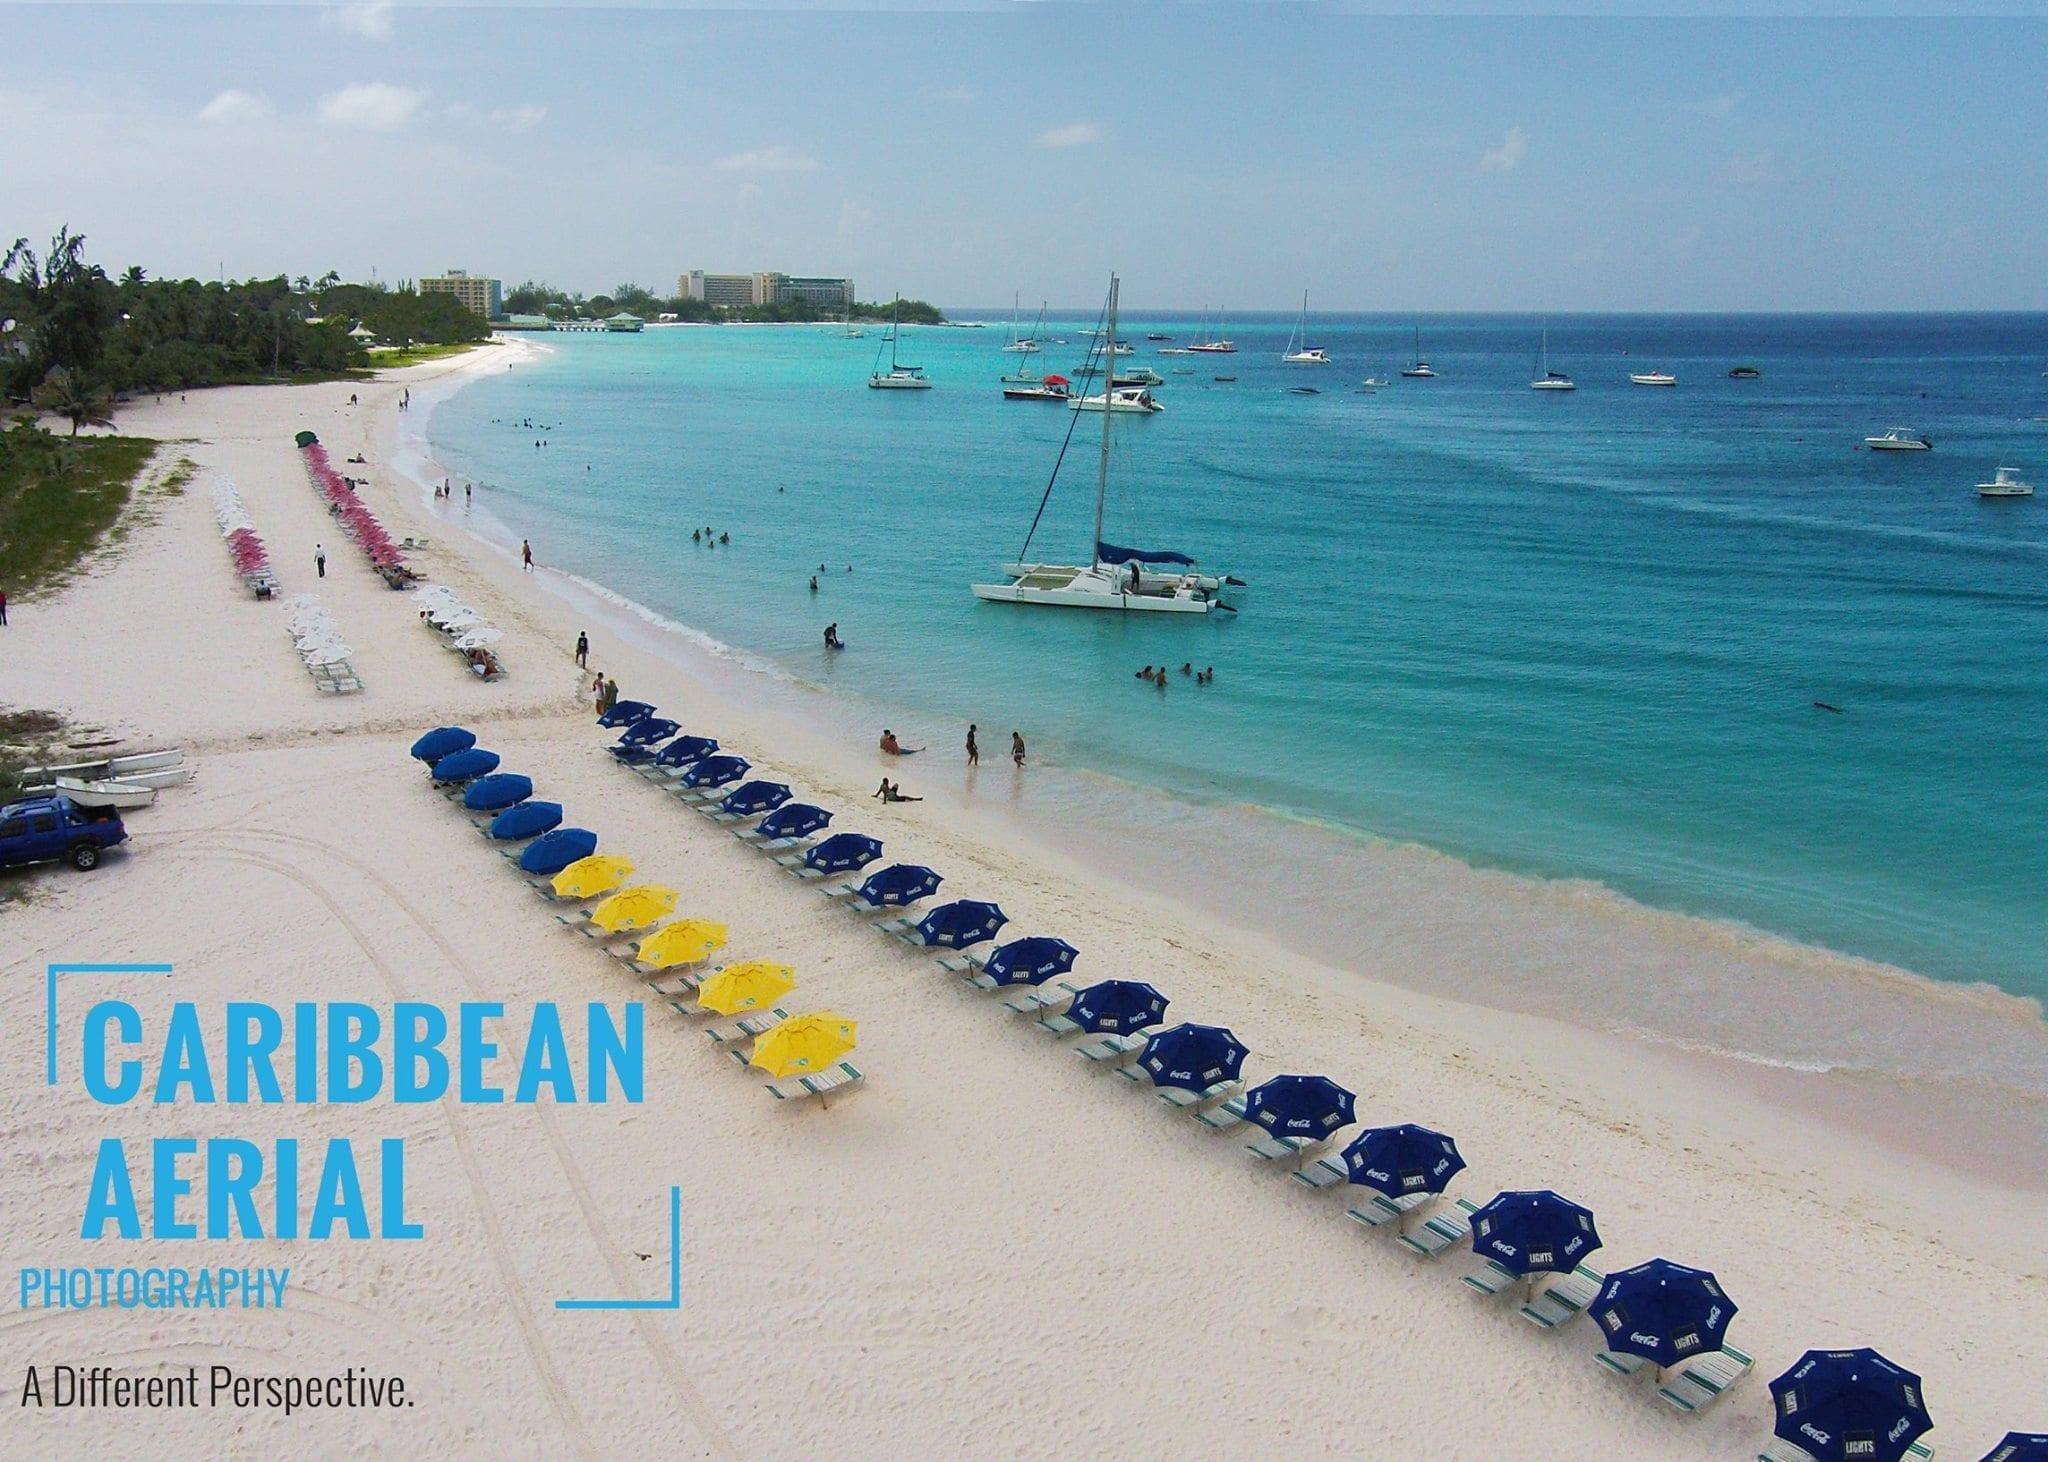 caribbean-aerial-photography-001